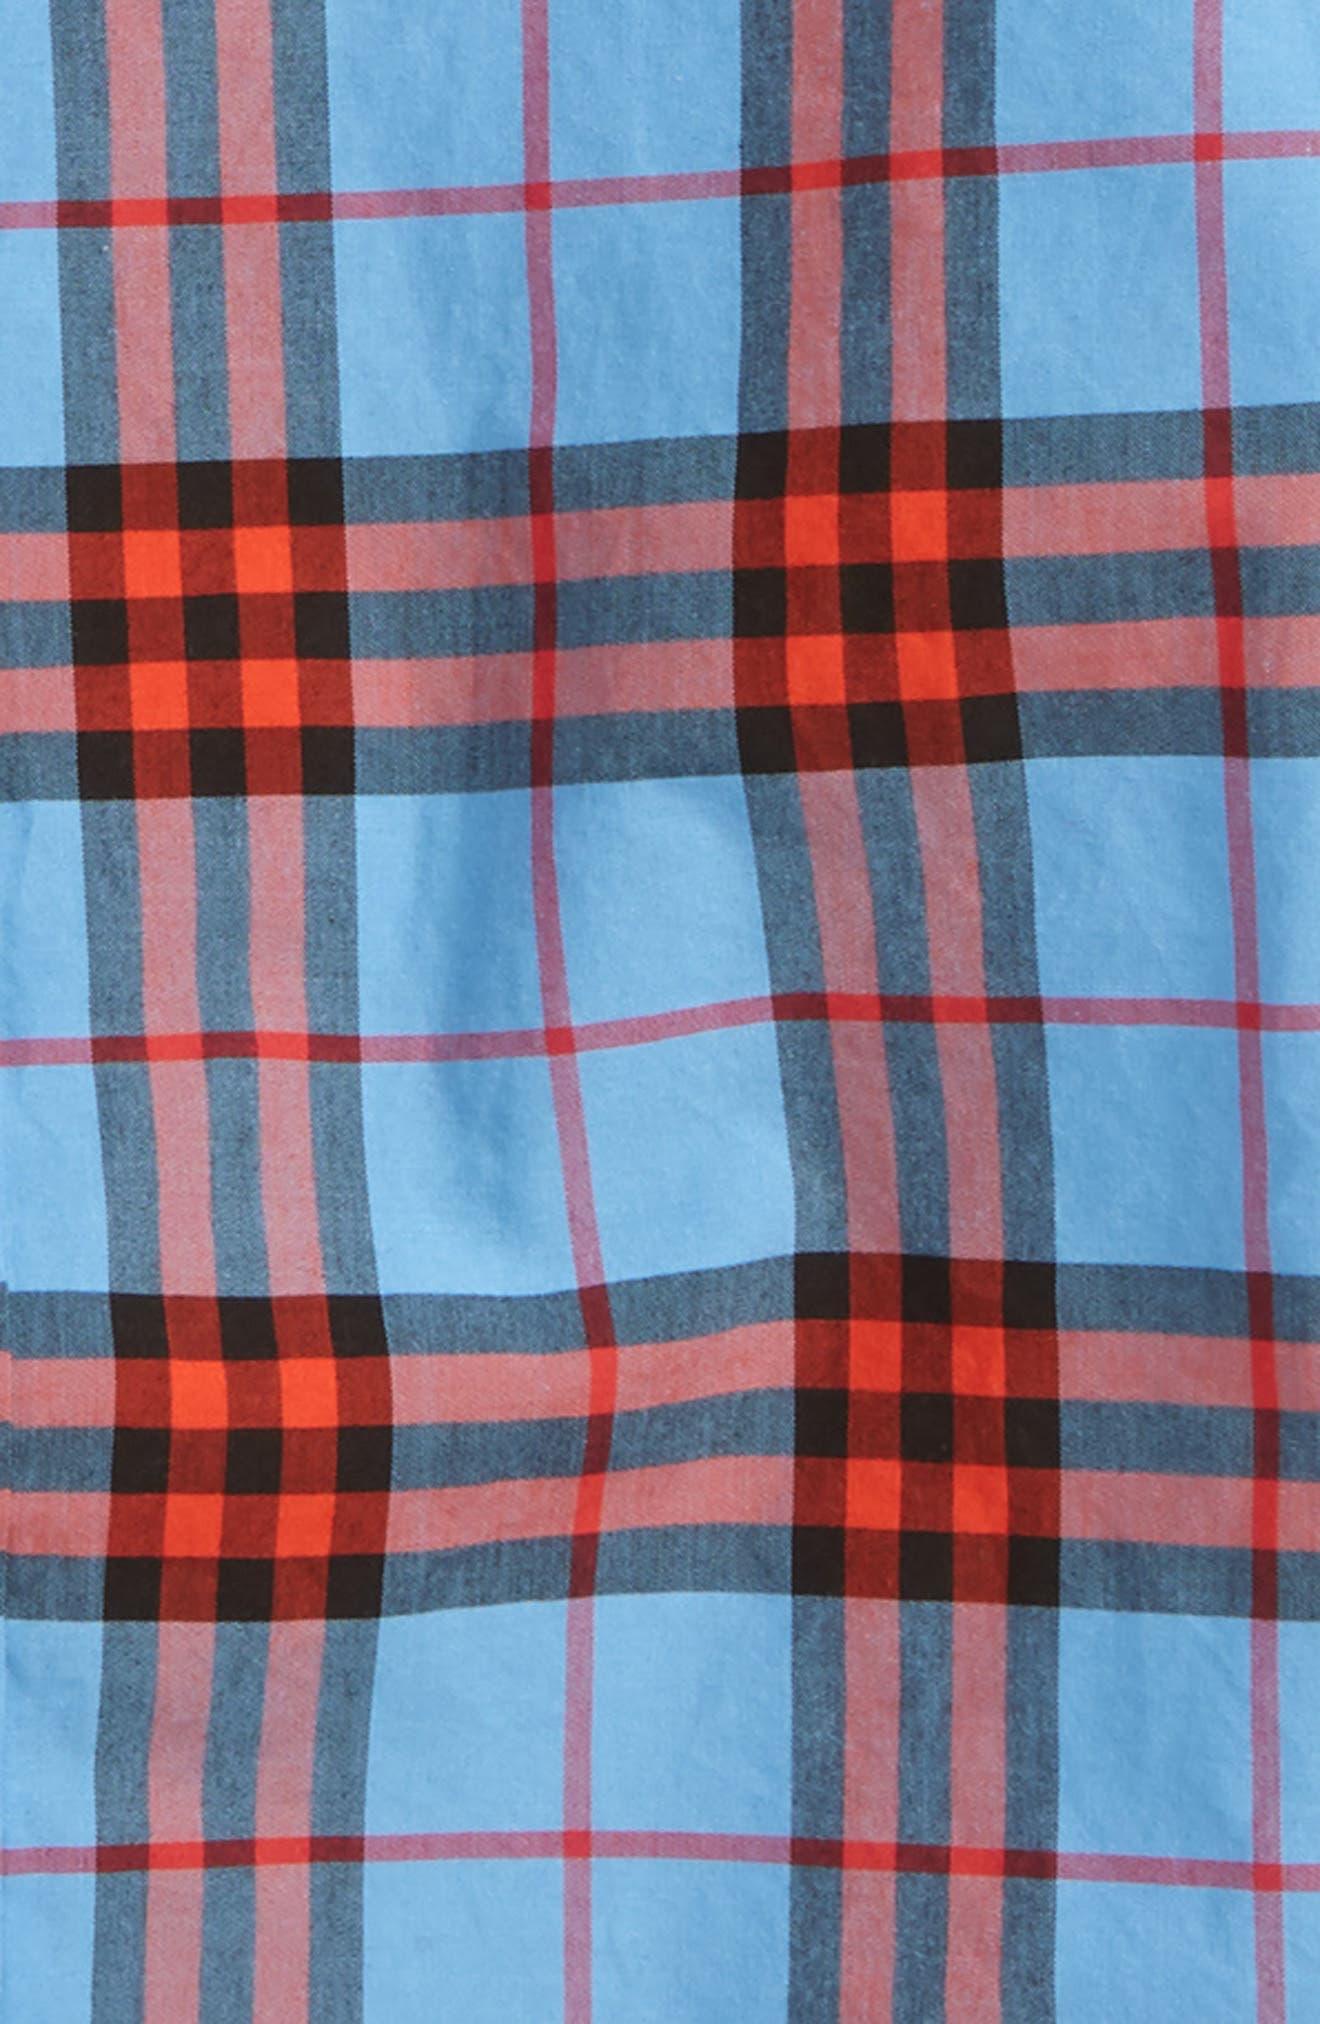 Clarkey Plaid Short Sleeve Shirt,                             Alternate thumbnail 2, color,                             CORNFLOWER BLUE